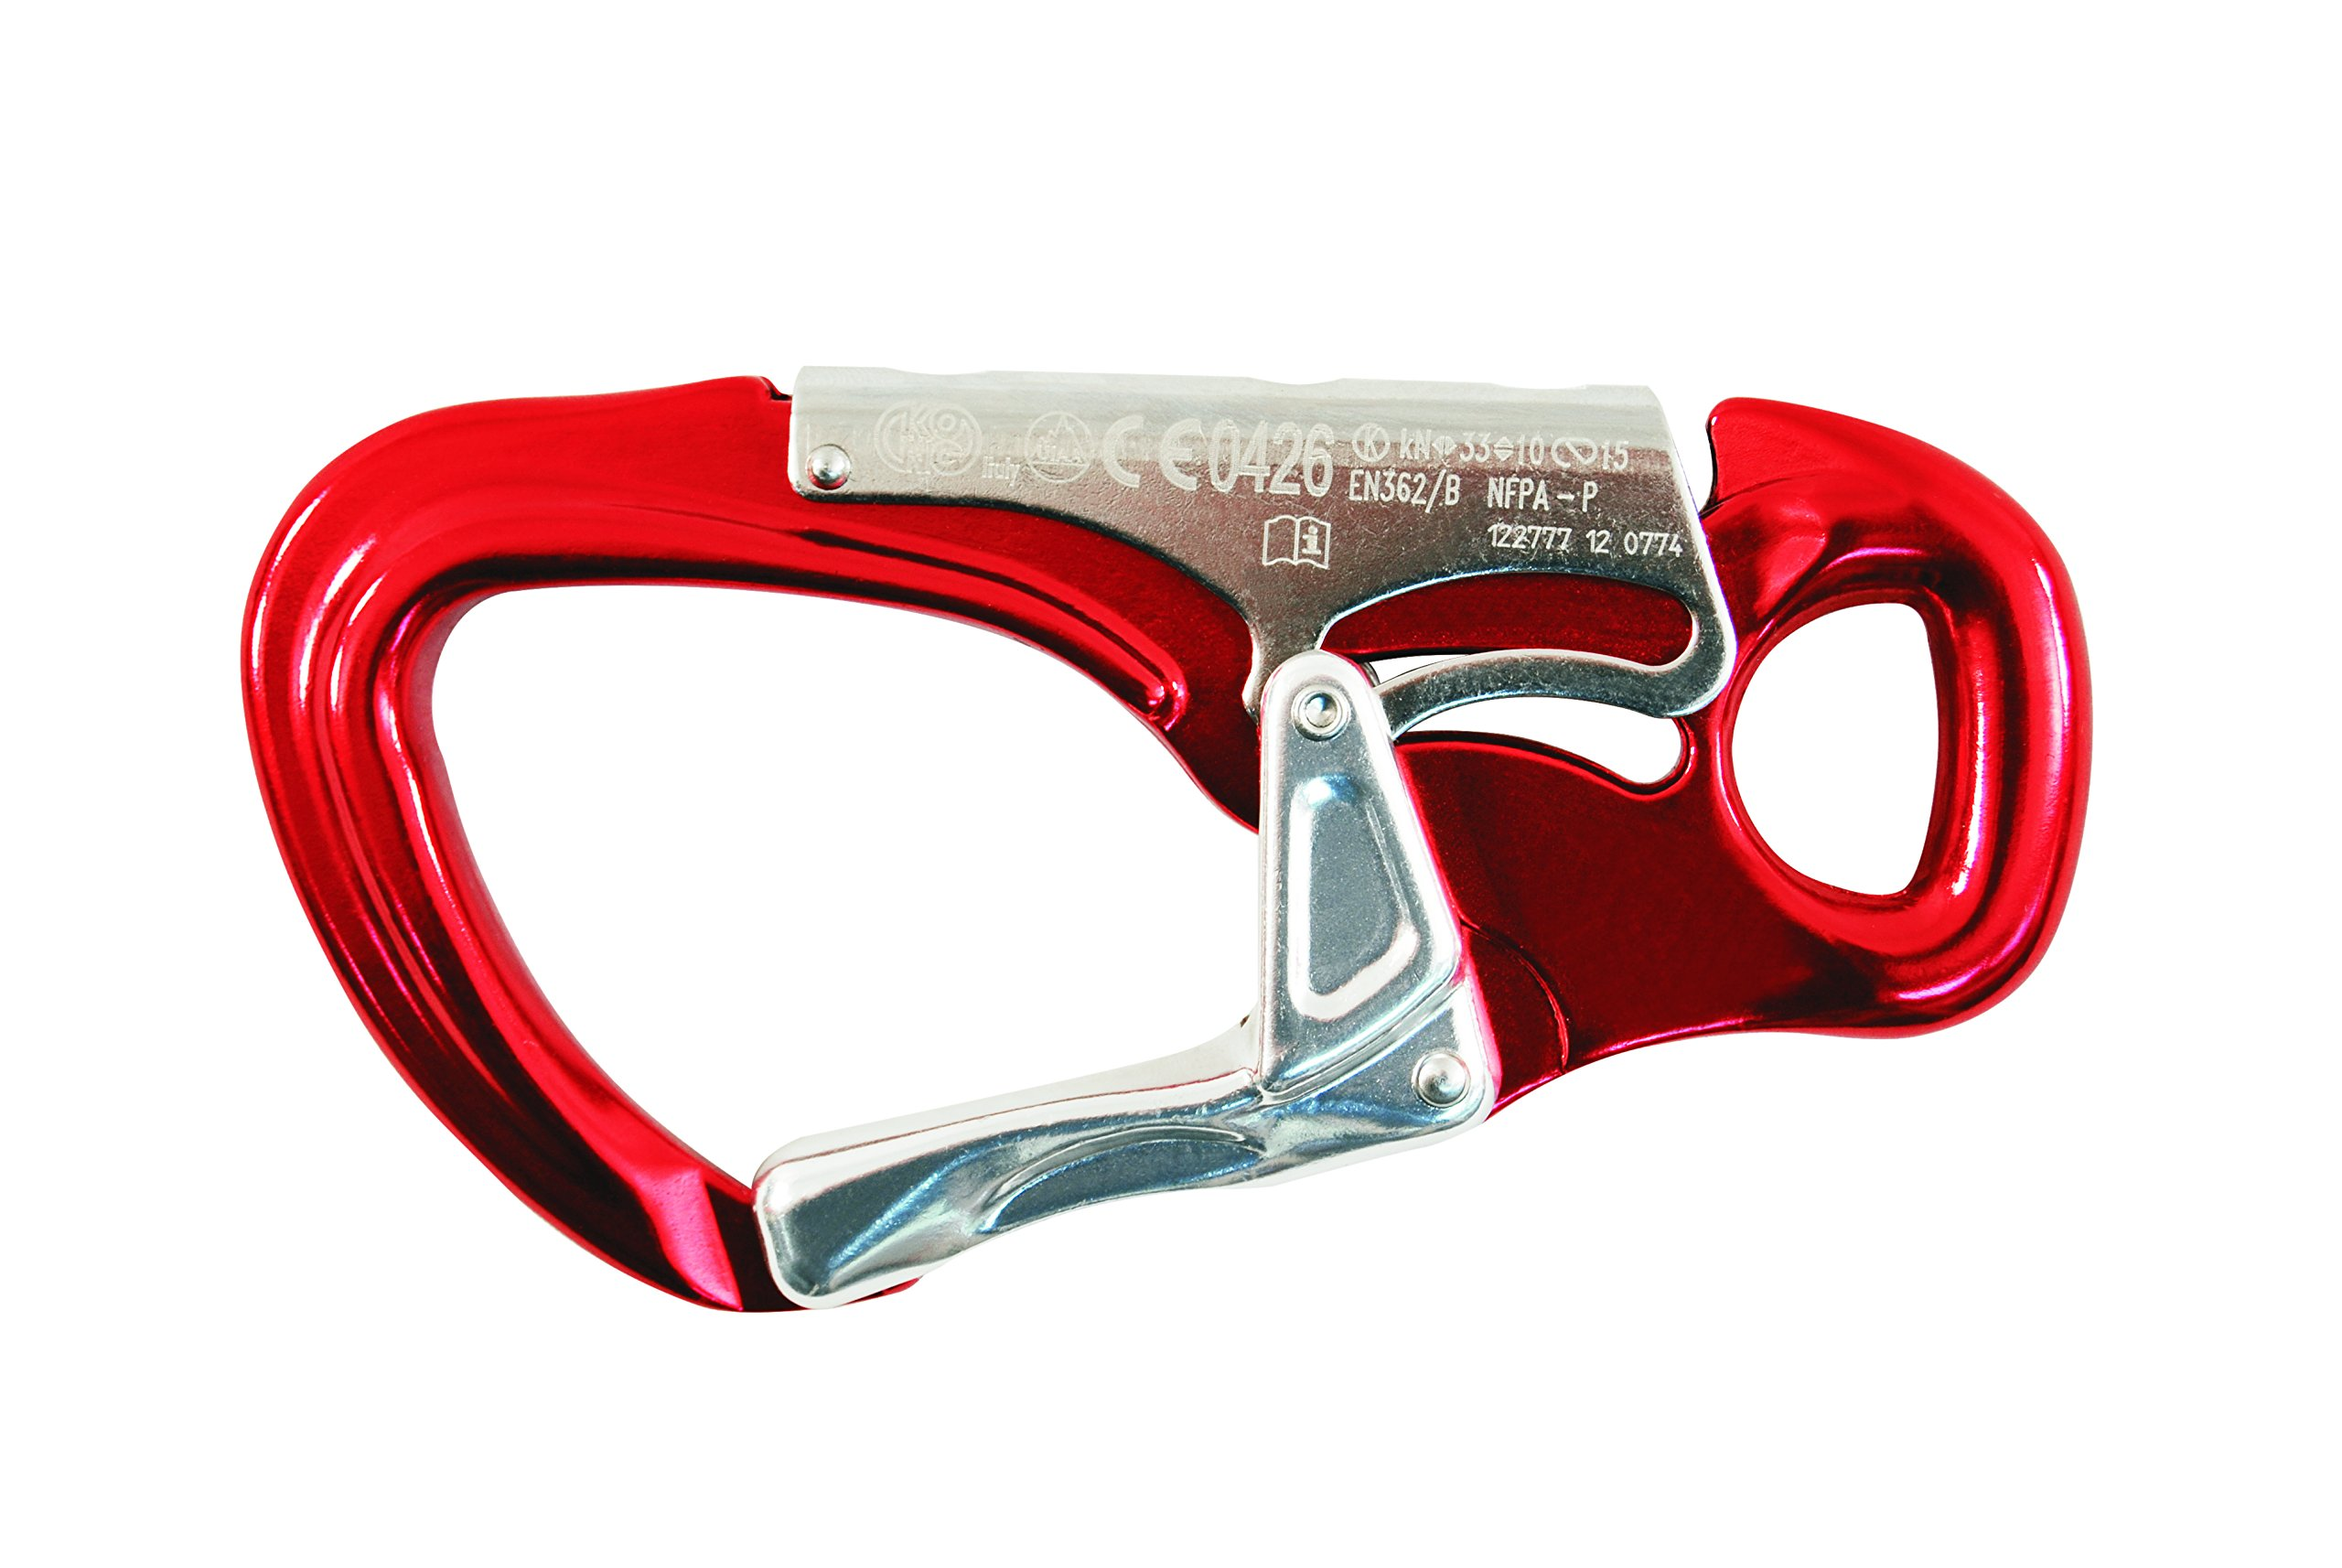 KONG Anodized Tango Carabiner